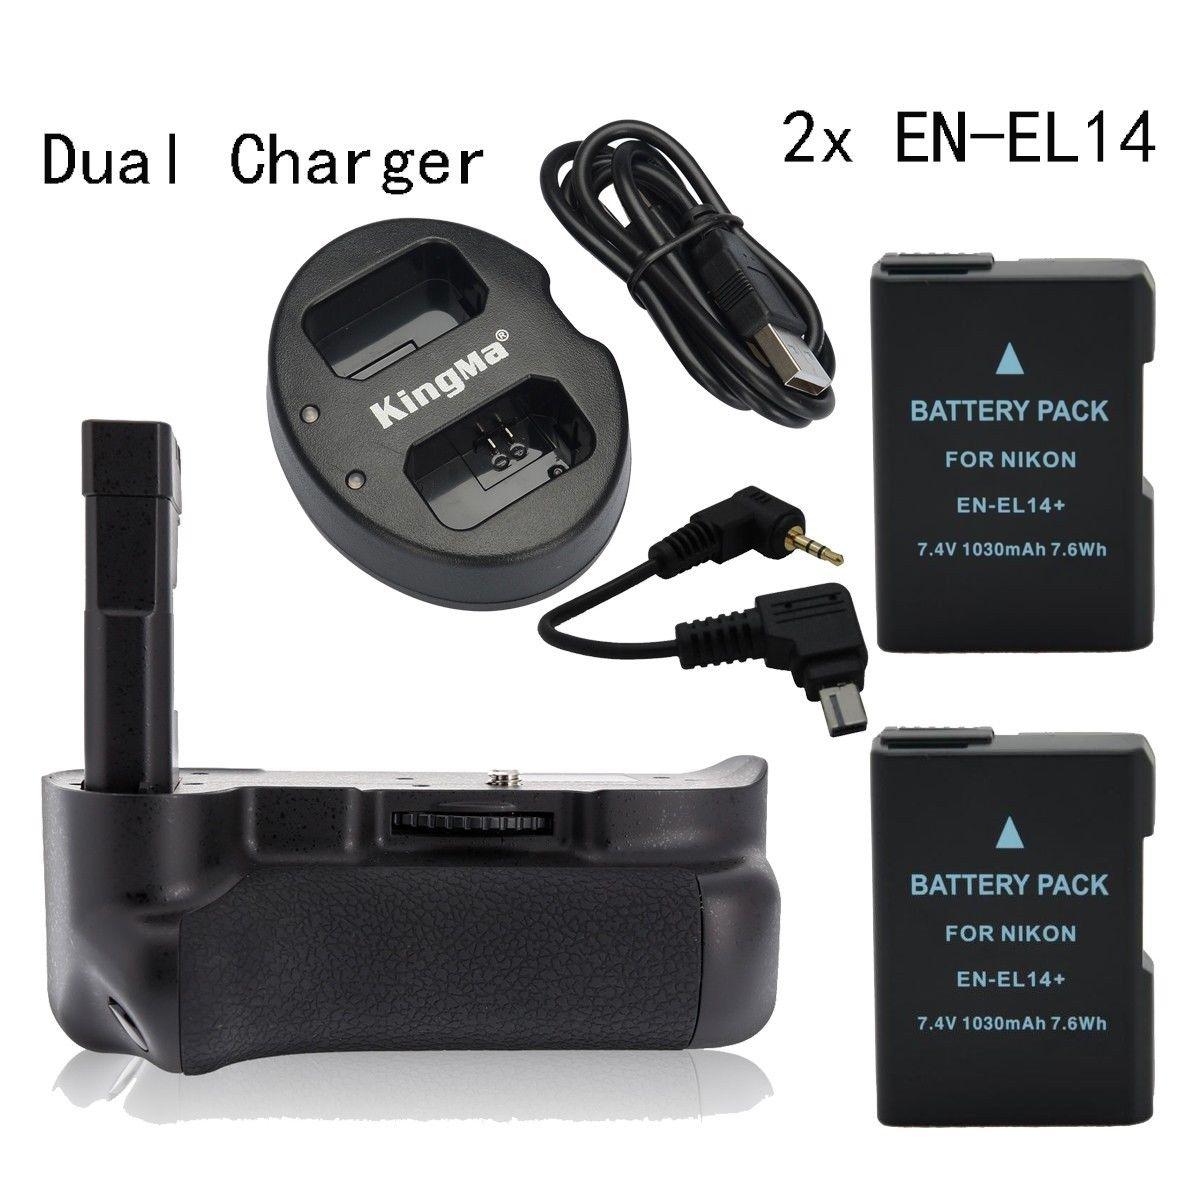 Meike Vertical Battery Pack Grip for Nikon D5300 + 2* EN-EL14 + Dual Charger meike vertical battery grip for nikon d7100 d7200 as mb d15 2 en el15 dual charger